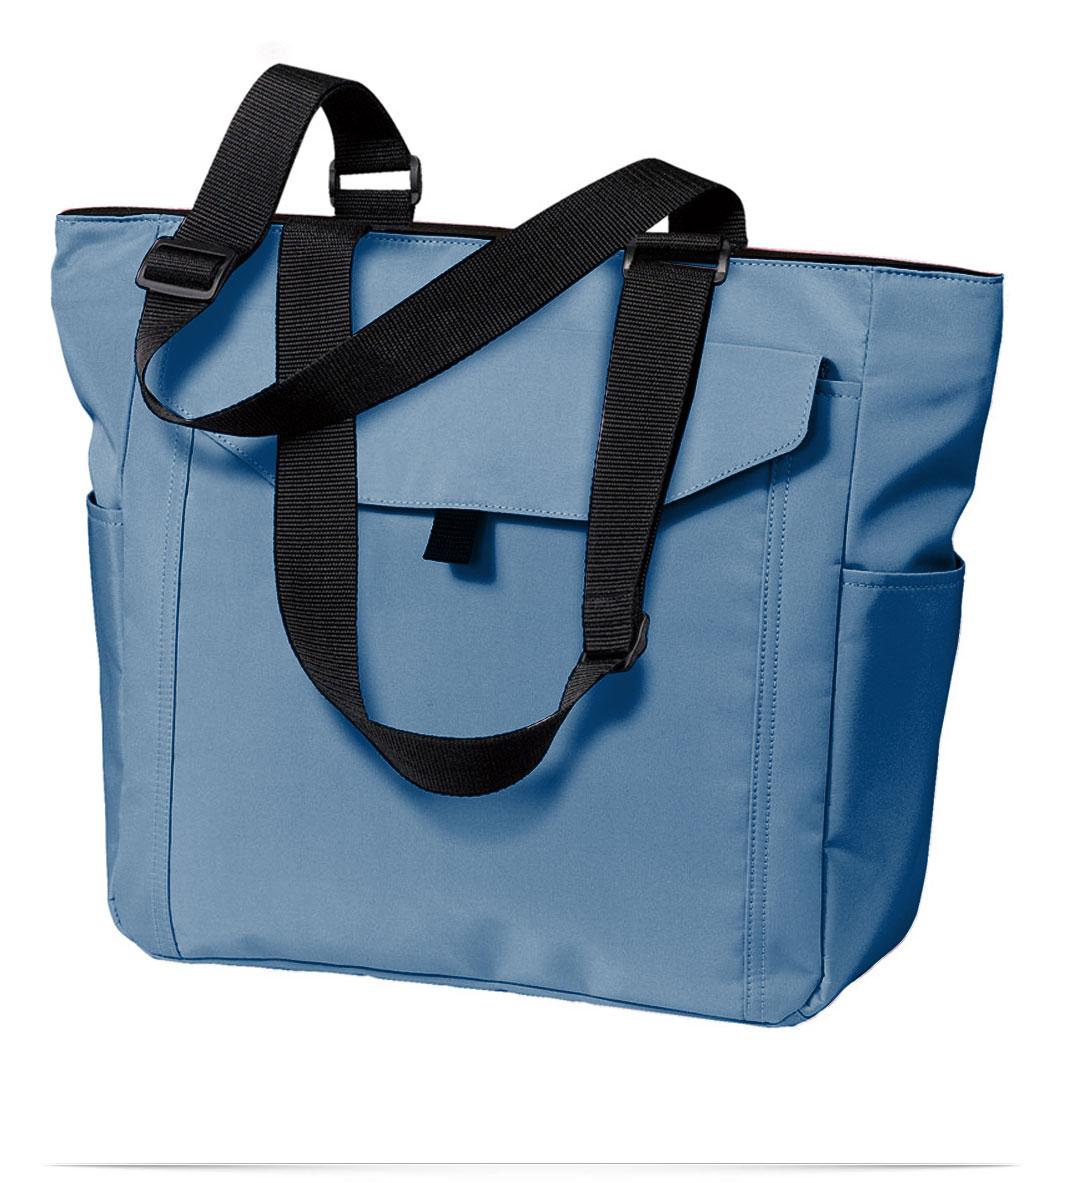 Customize Microfiber Tote Bag